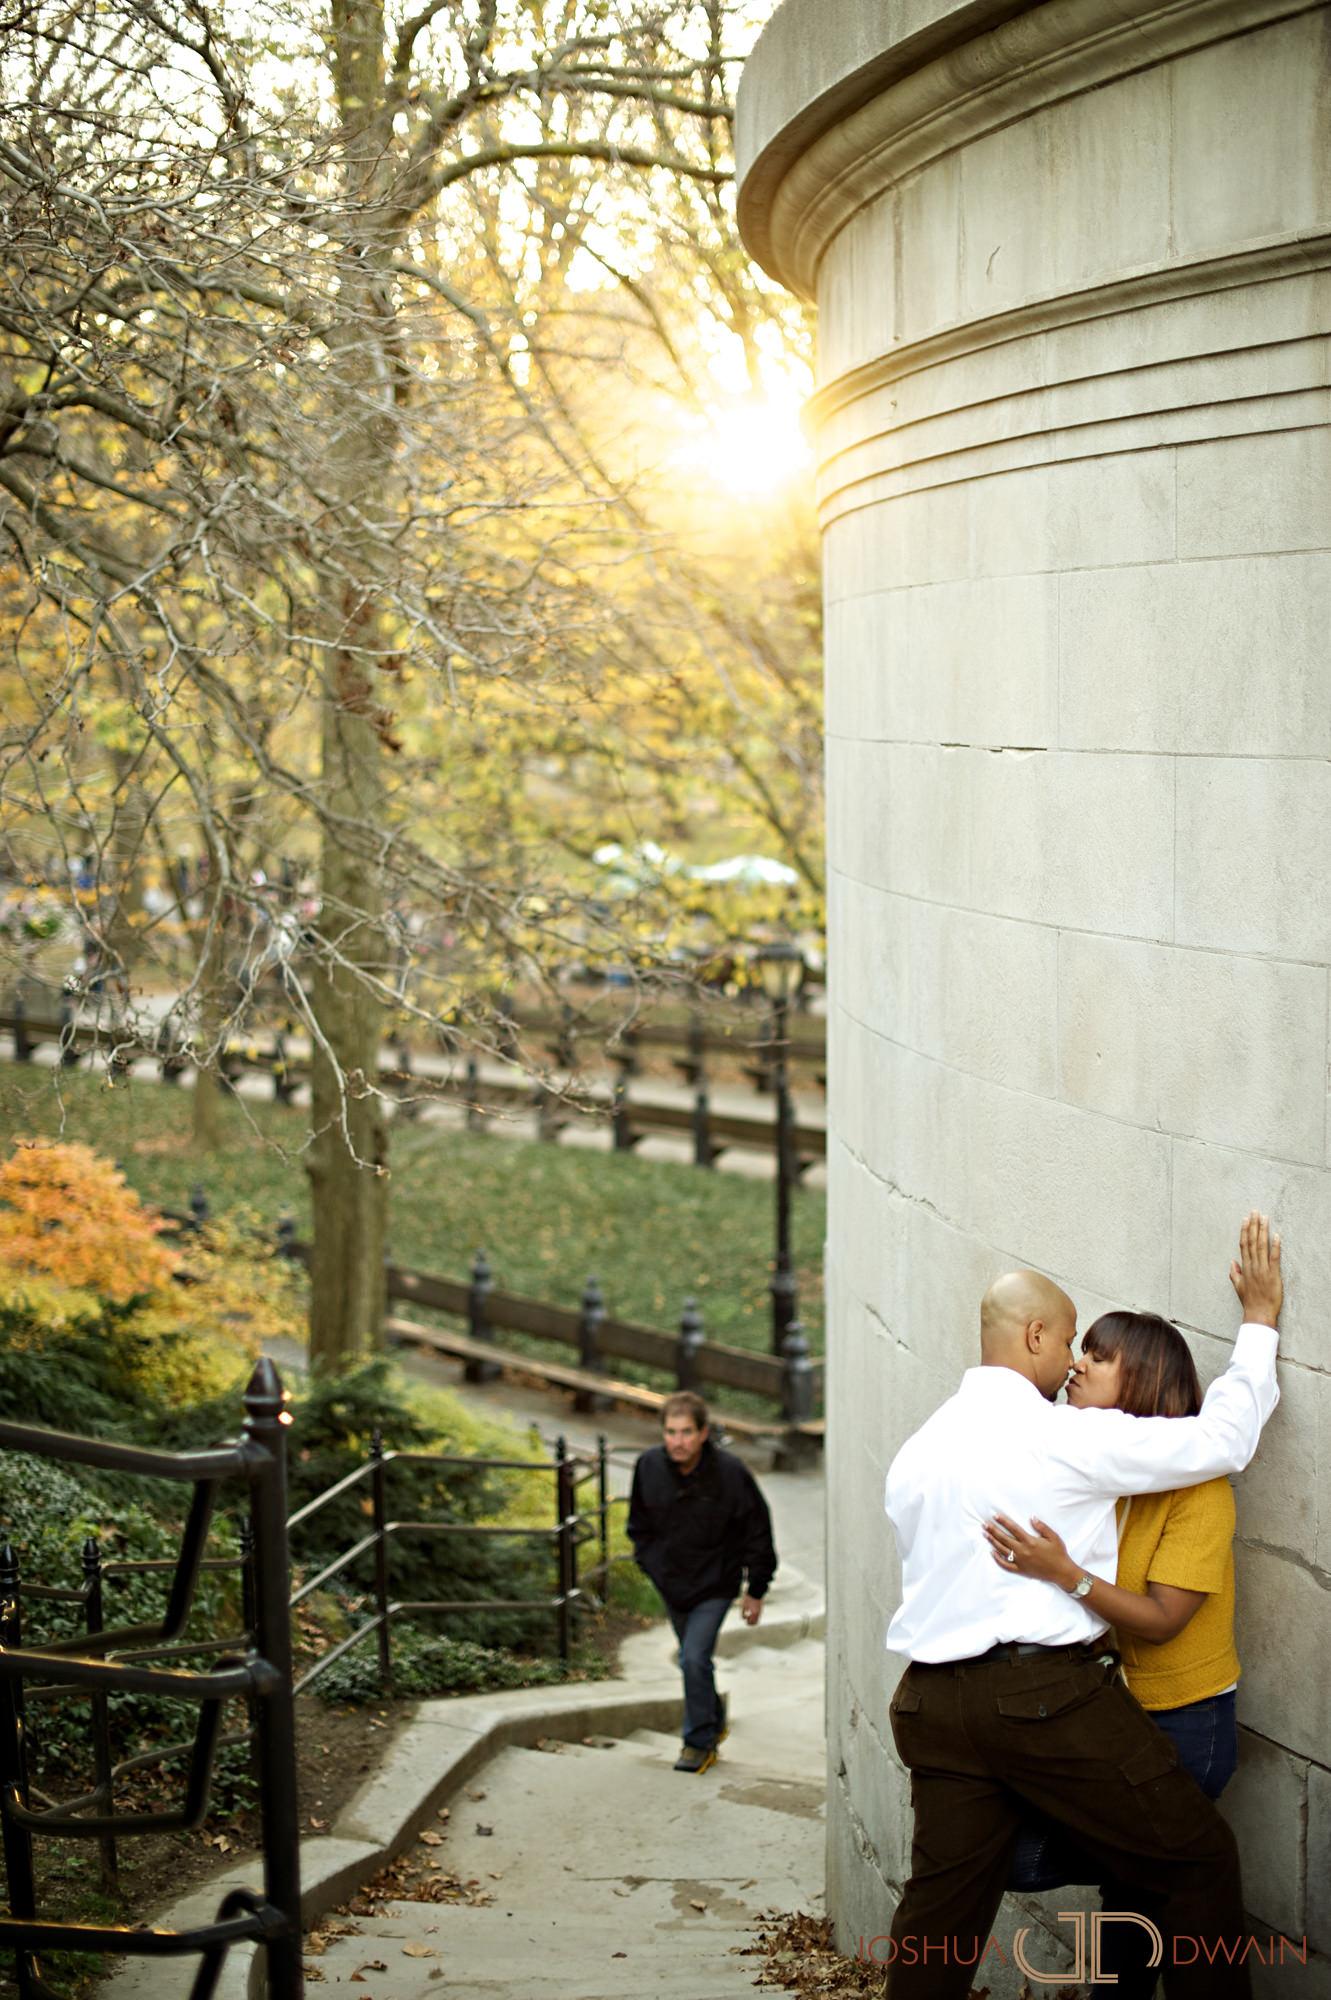 carol-shiloh-005-central-park-new-york-city-engagement-photographer-joshua-dwain-08